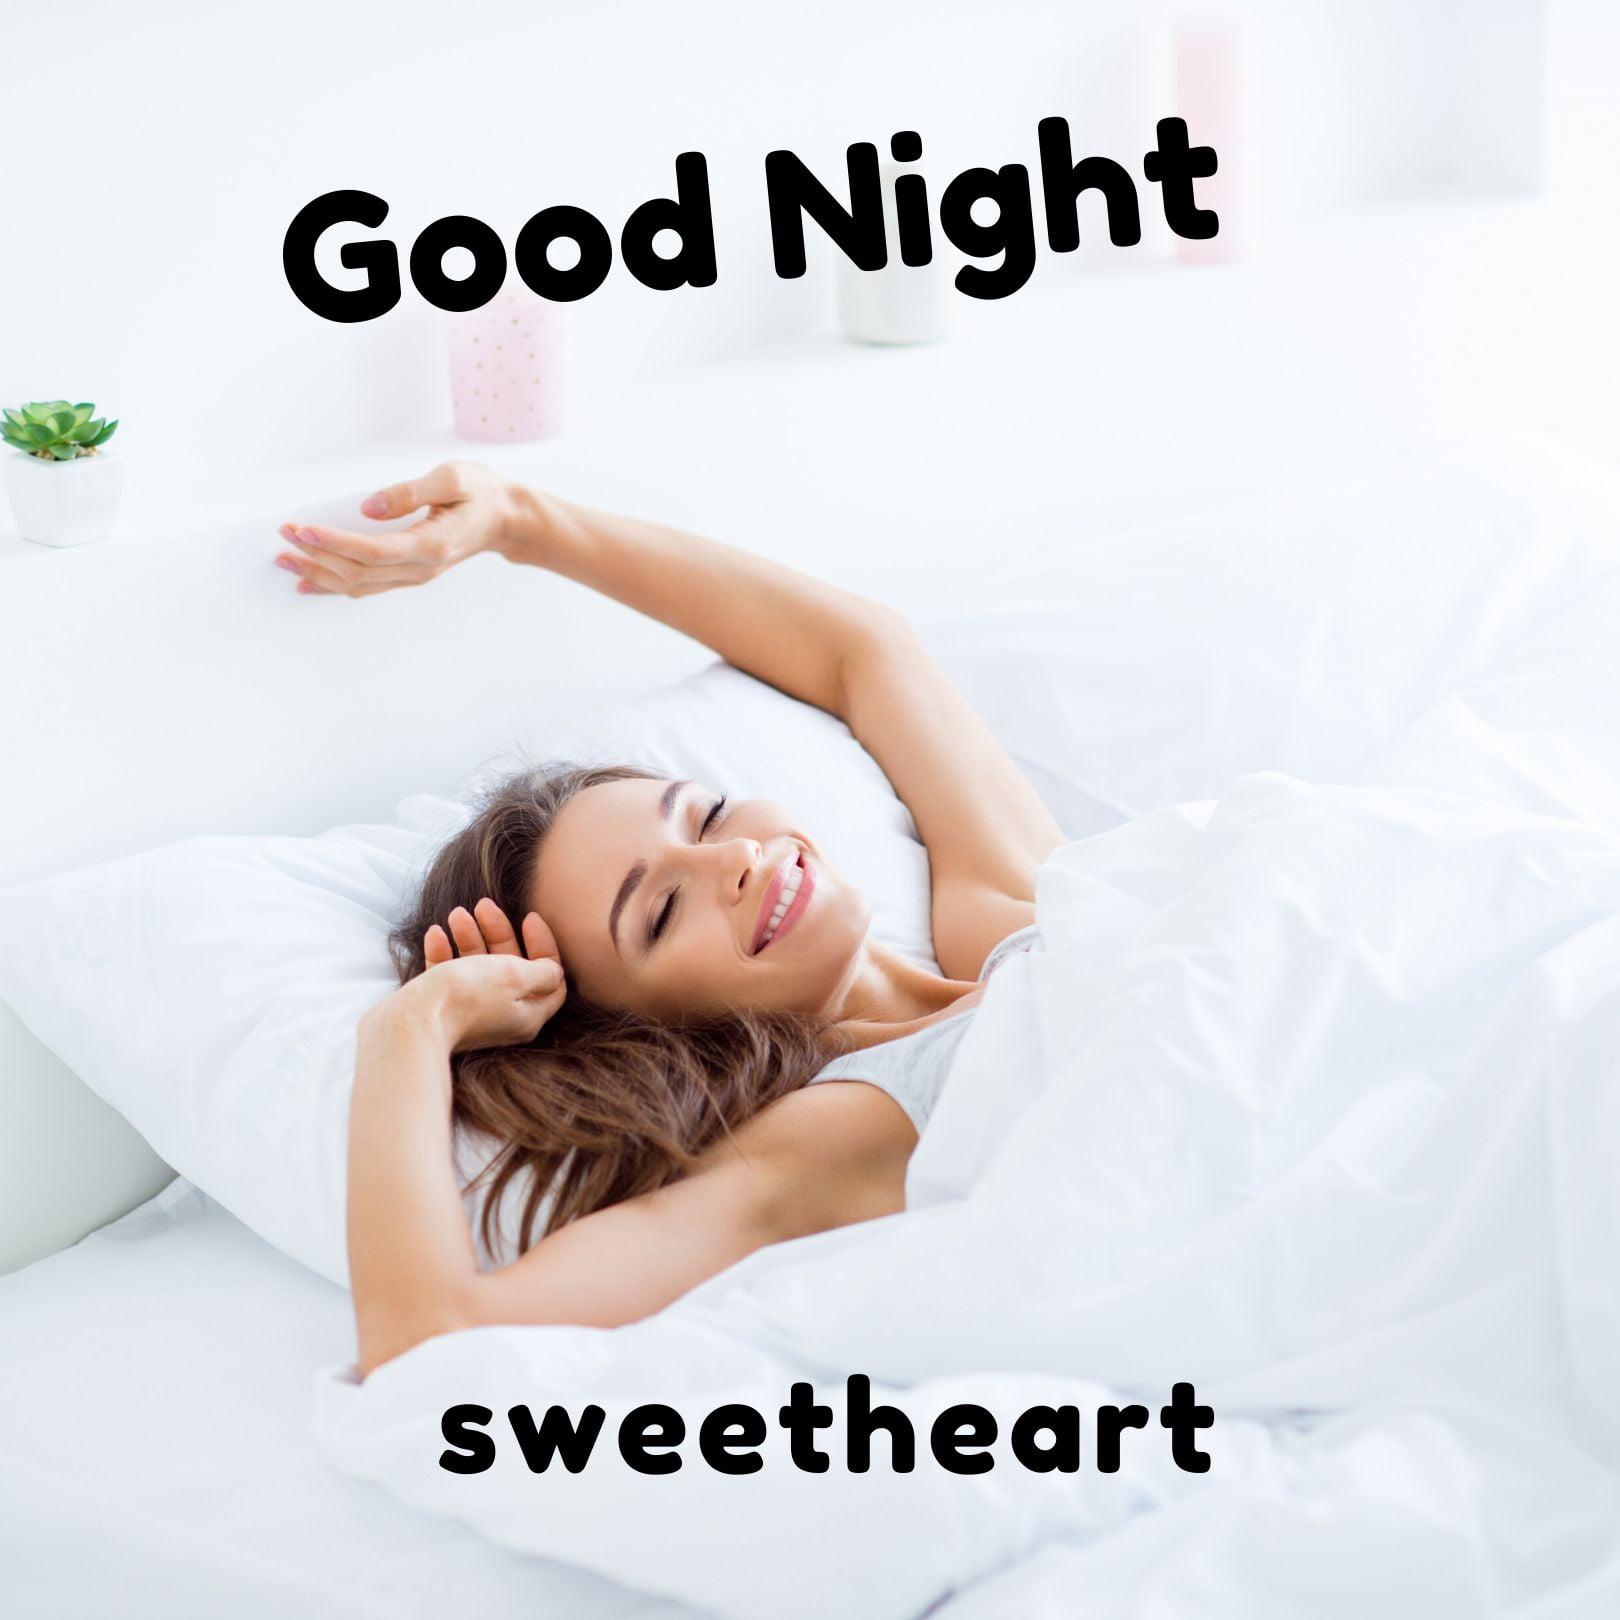 Good Night Sweetheart Image full HD free download.